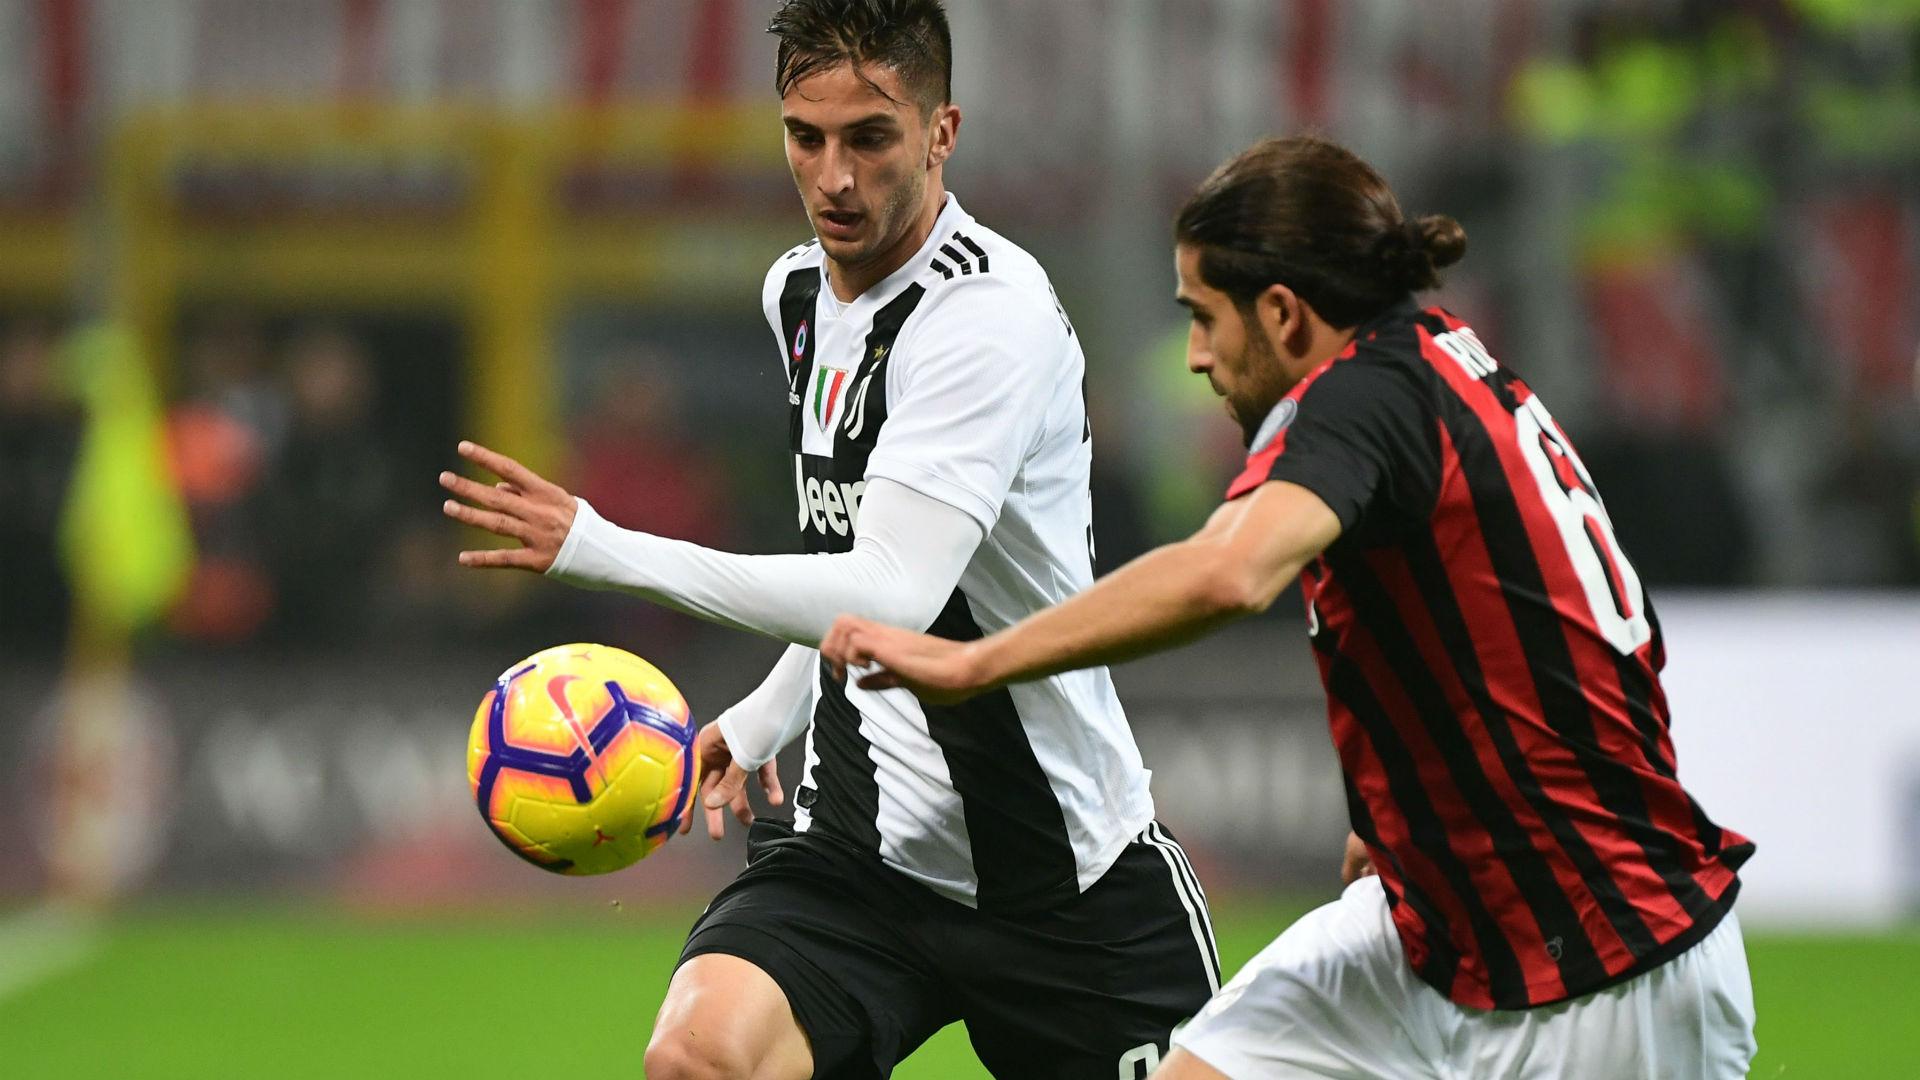 Biglietti Supercoppa italiana: già venduti 50 mila tagliandi